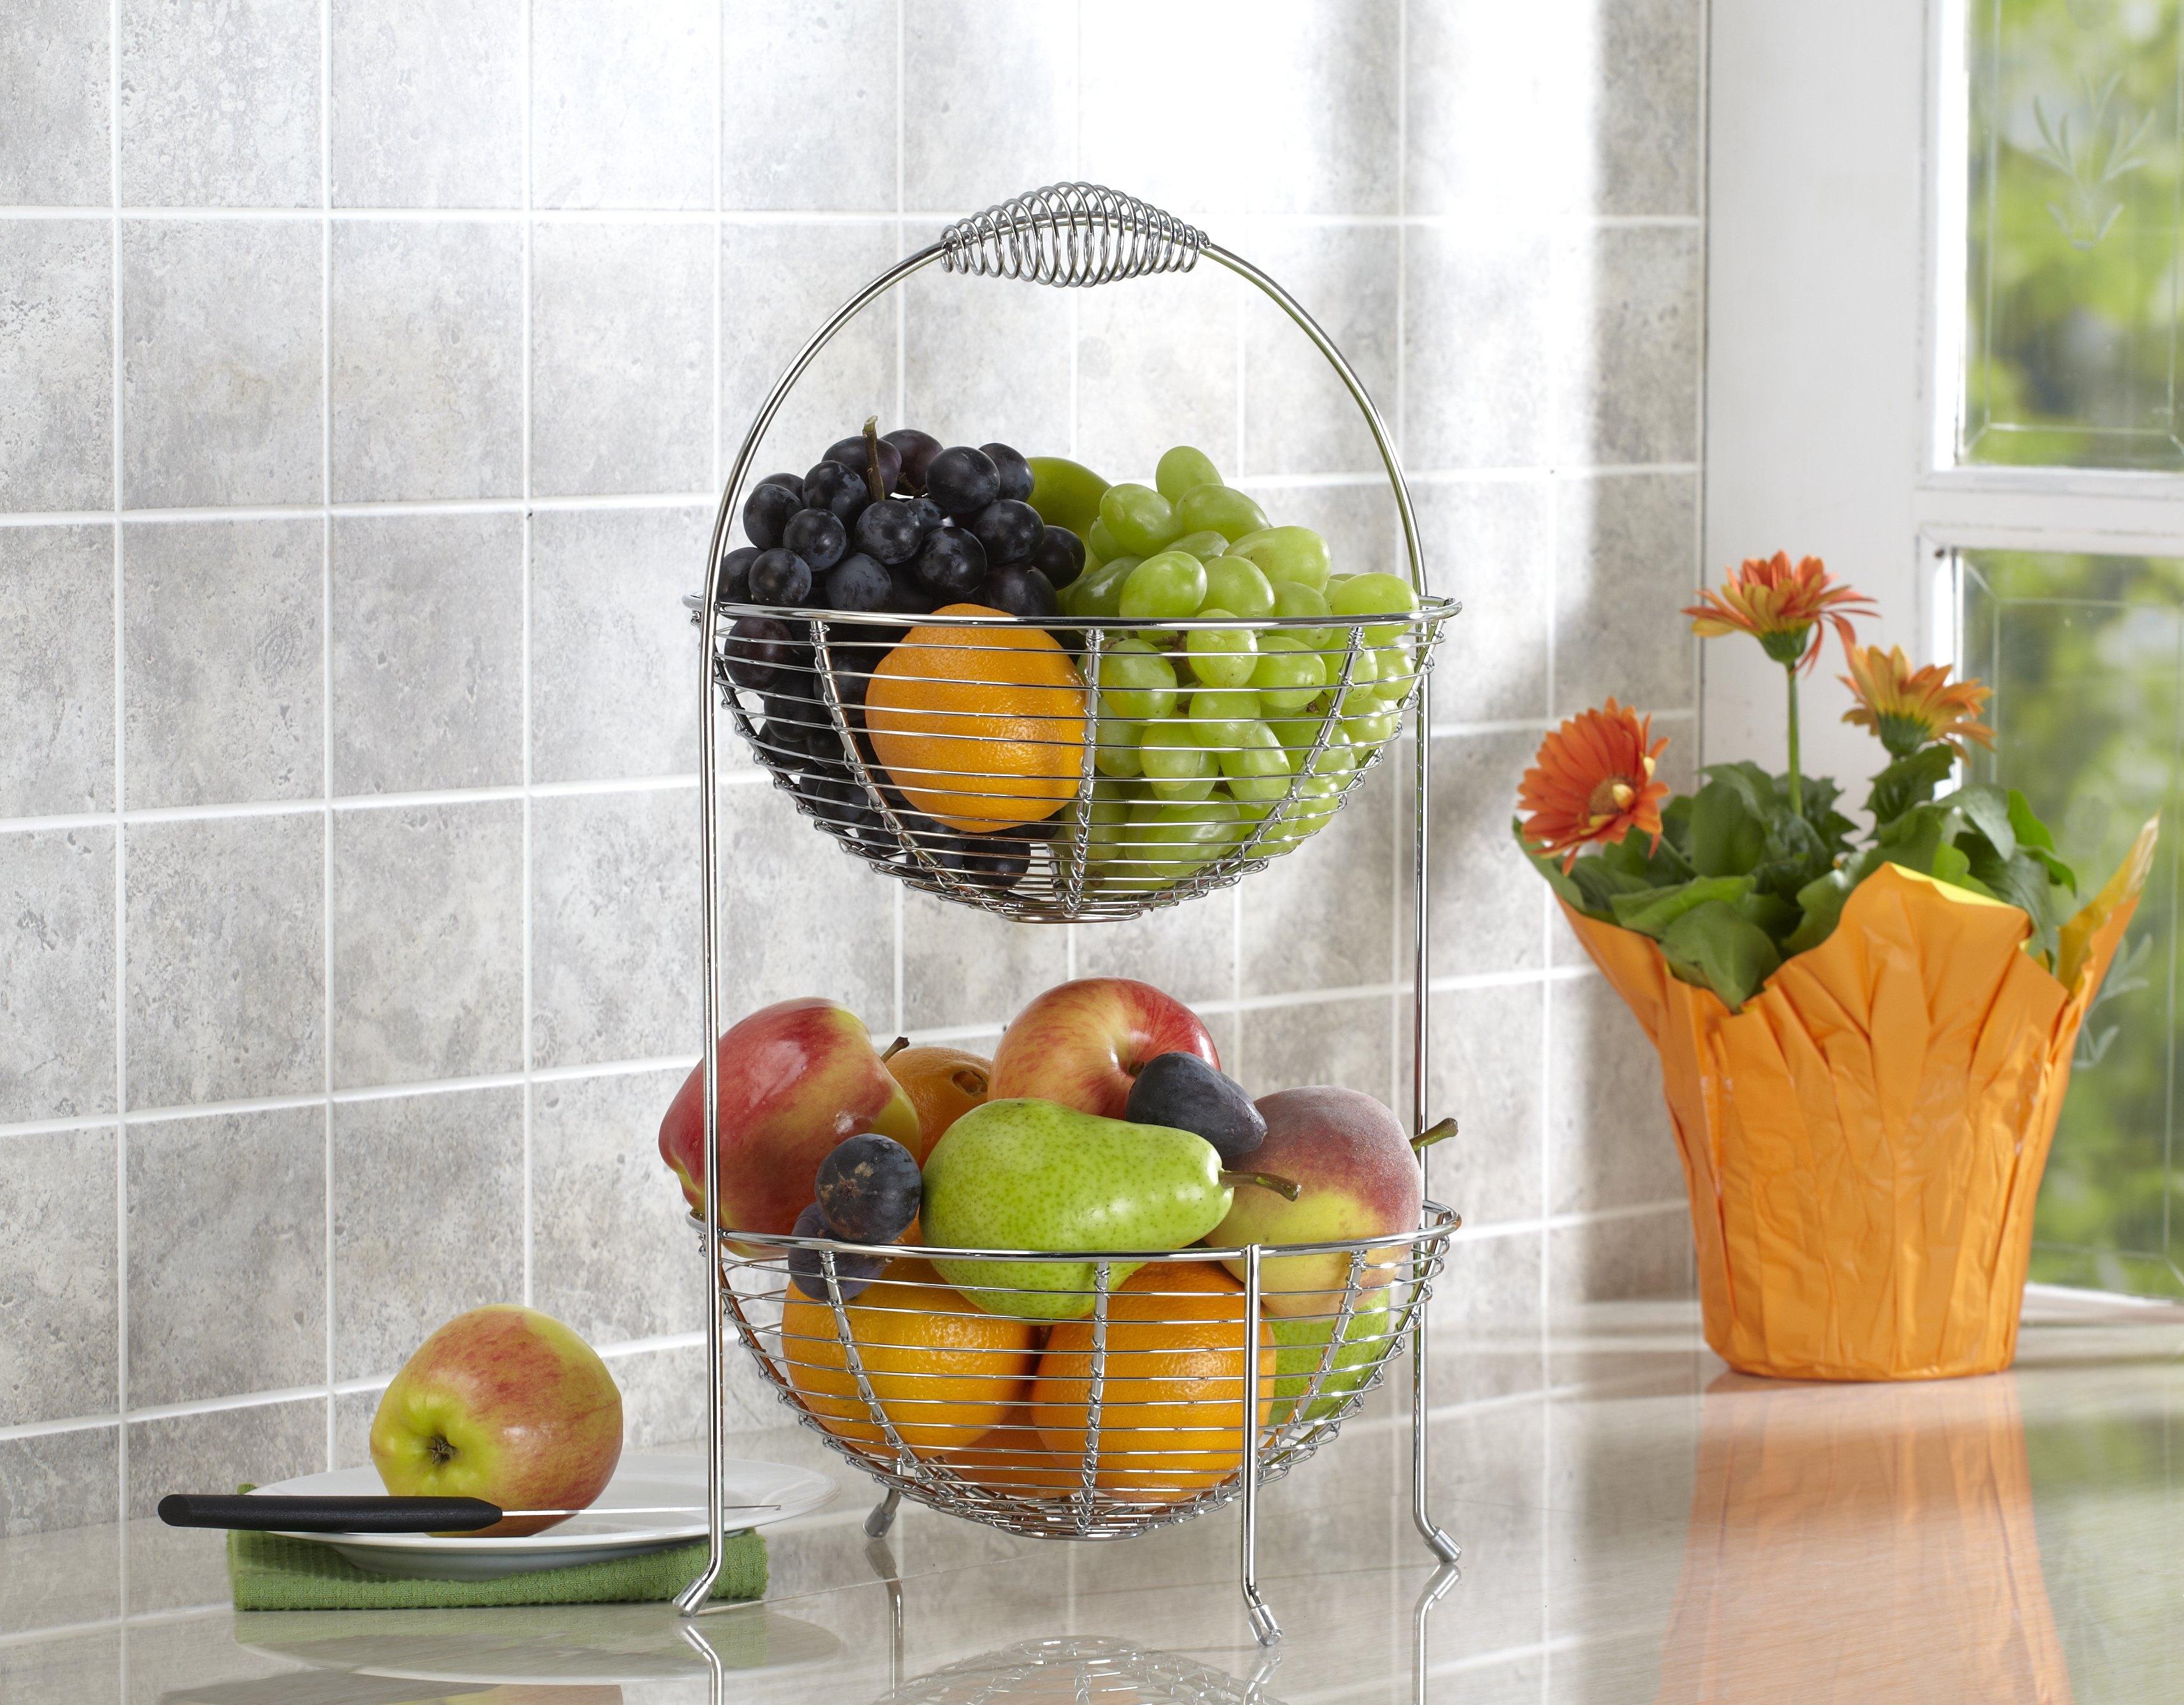 2-tier fruit basket filled with fruit - easy snack station